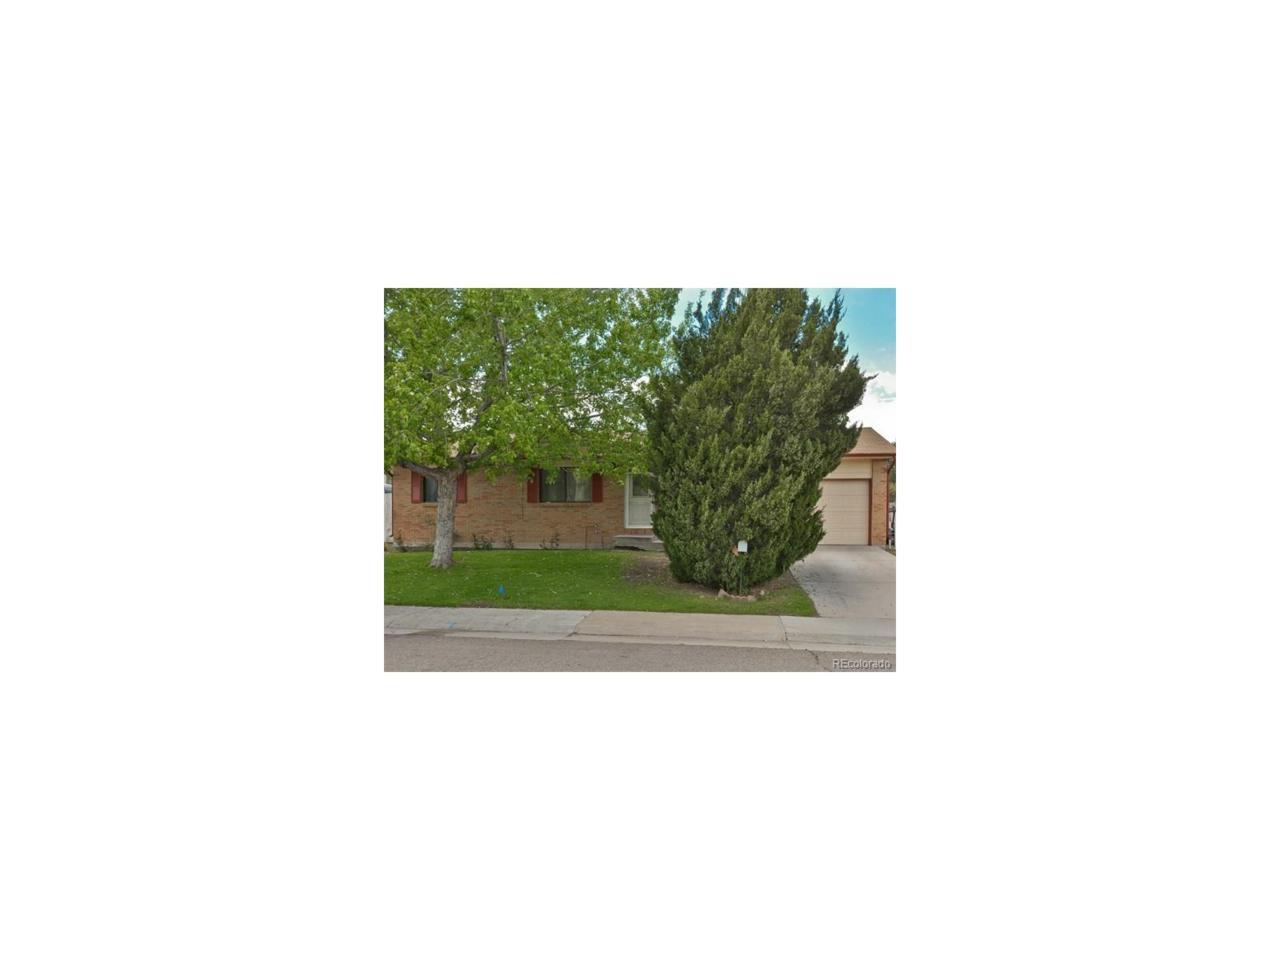 233 N 17th Court, Brighton, CO 80601 (MLS #7085436) :: 8z Real Estate